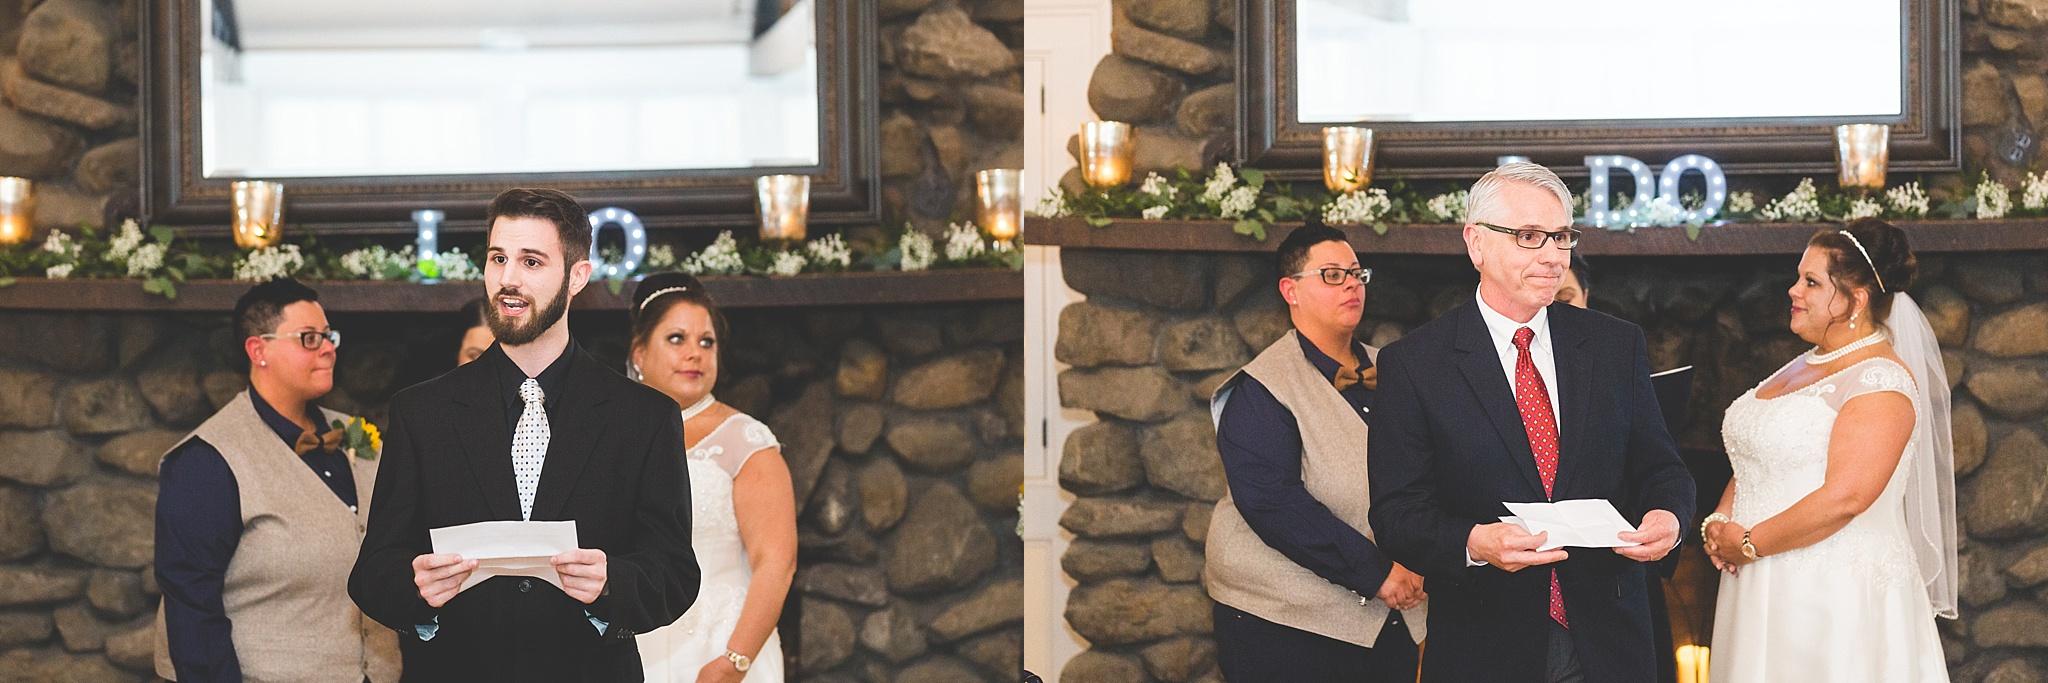 Albany_Wedding_Photographer_1663.jpg